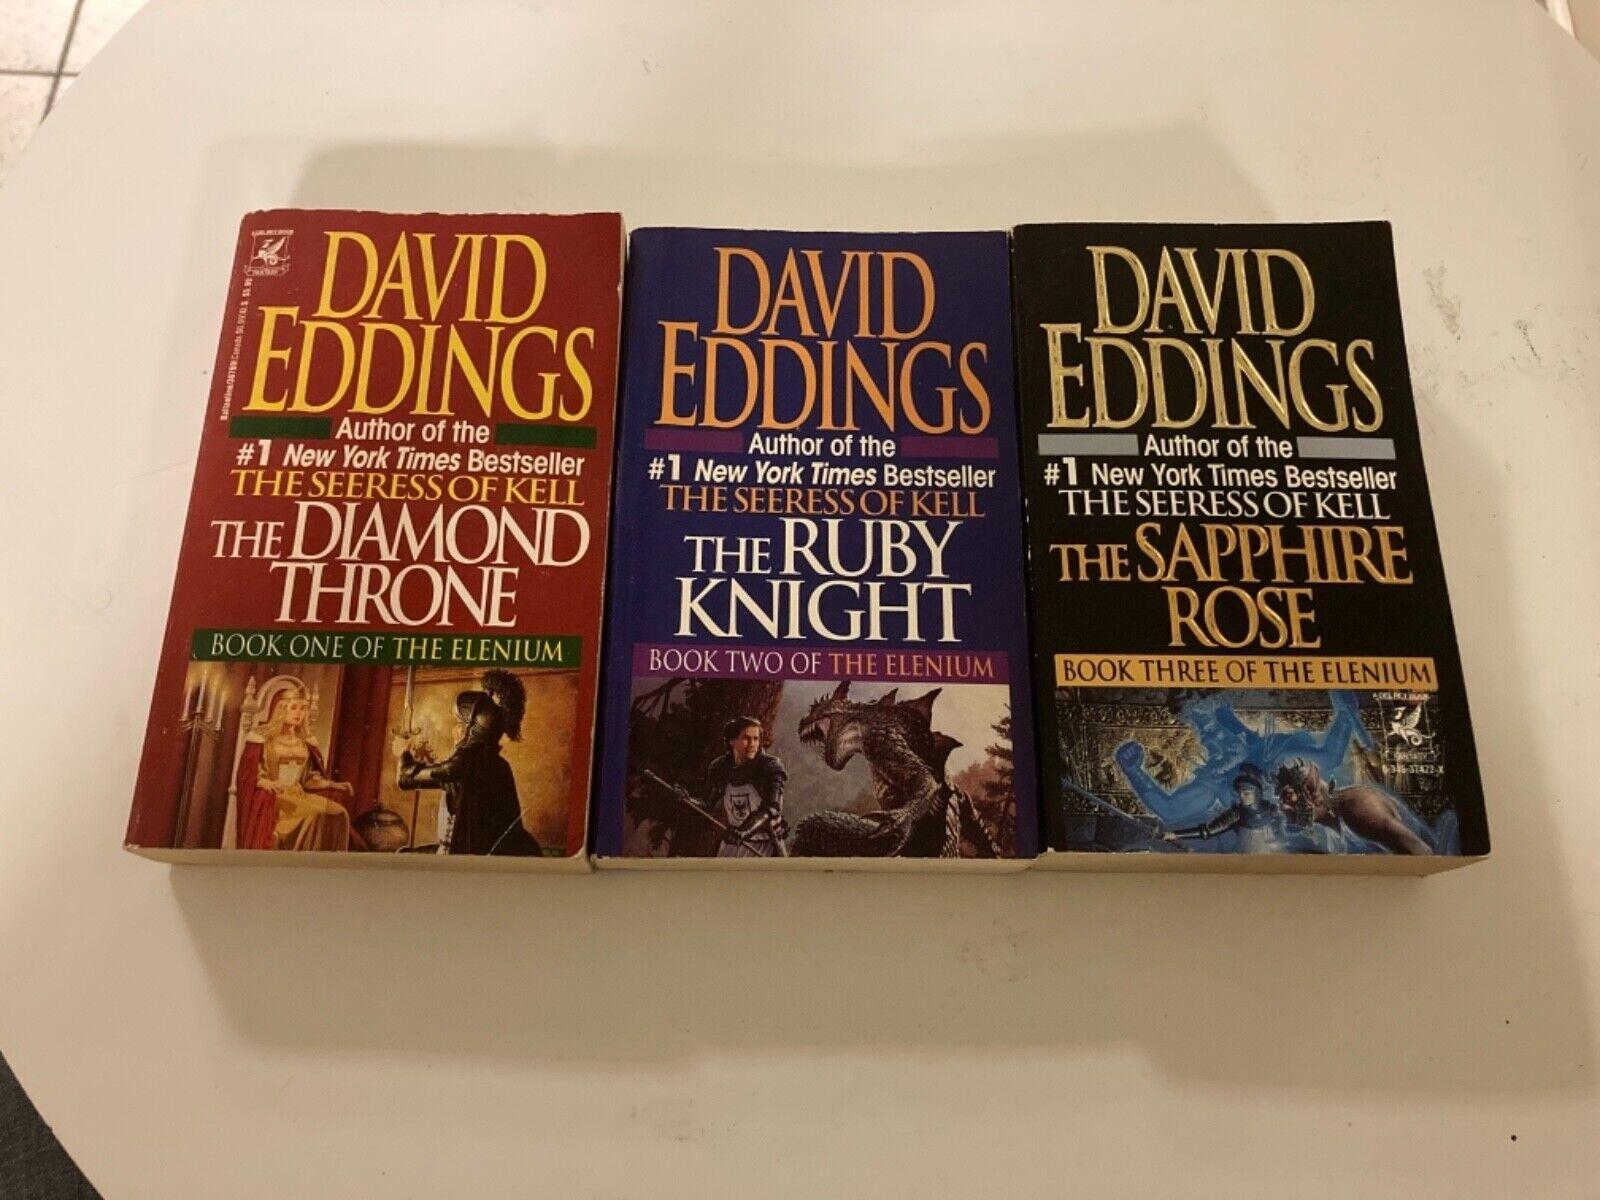 The Elenium Trilogy - Novels By David Eddings - Paperback Set - $11.99